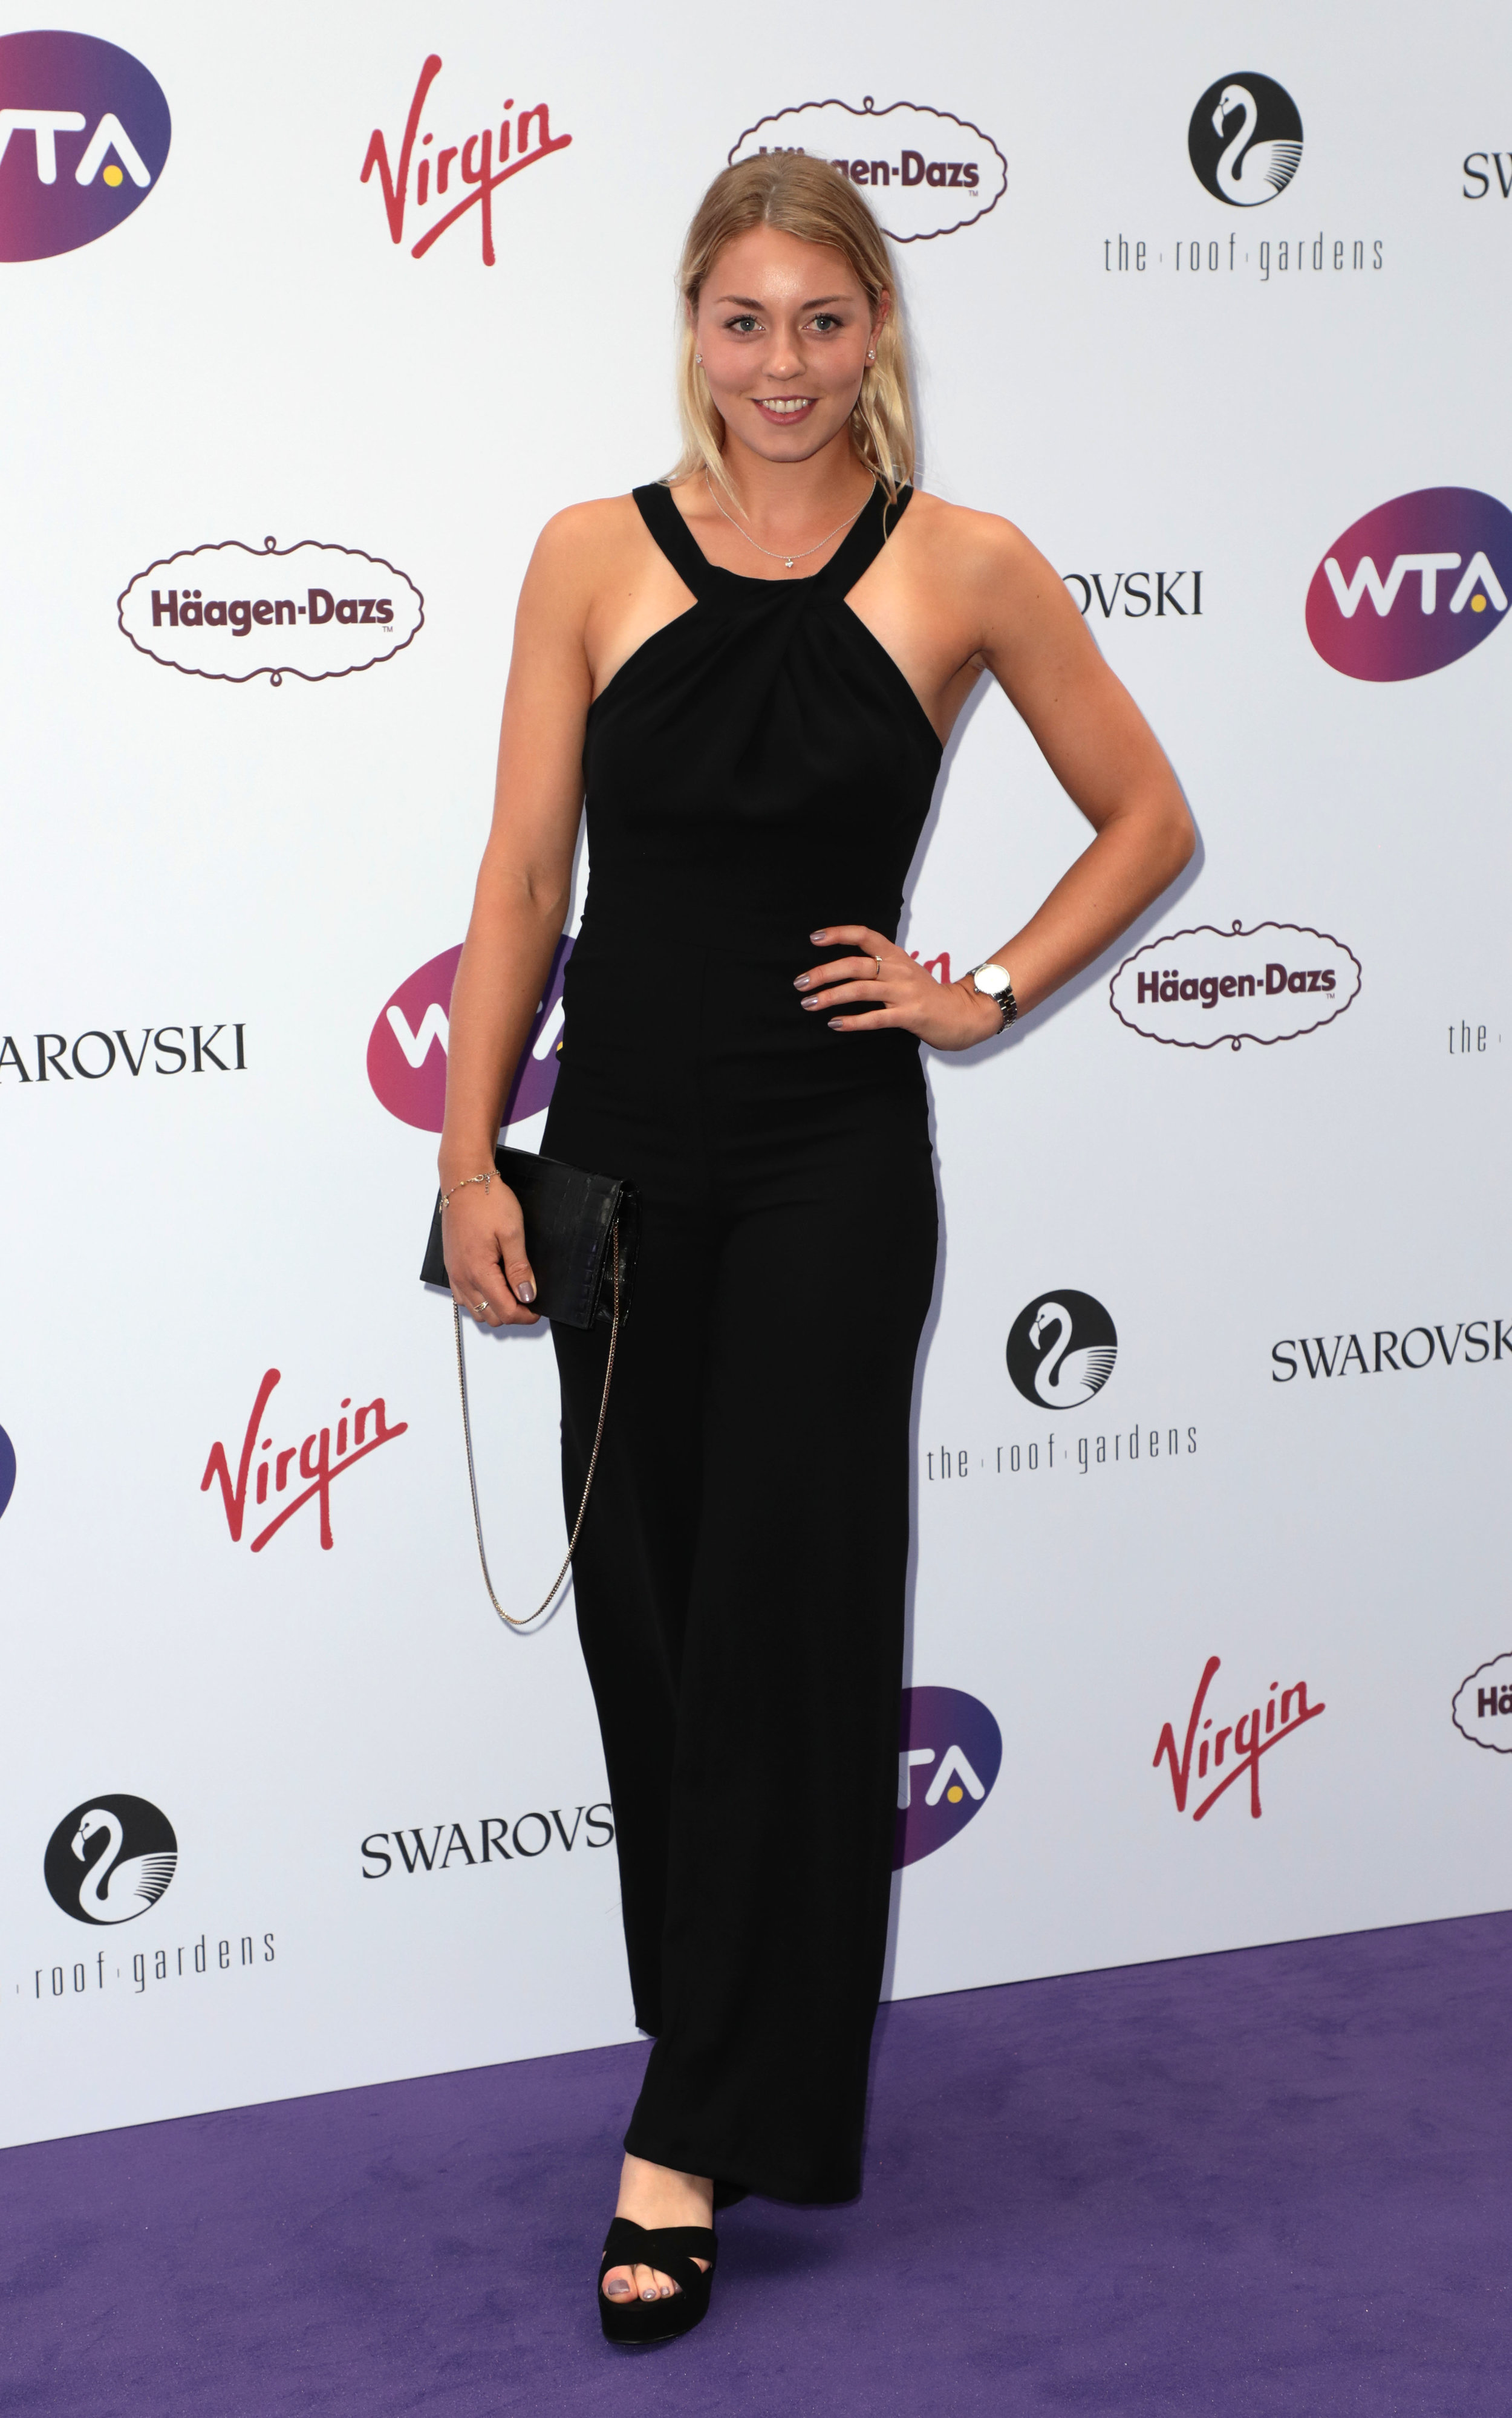 PHT_B5327_WTA_Pre_Wimbledon_Party_13851.JPG